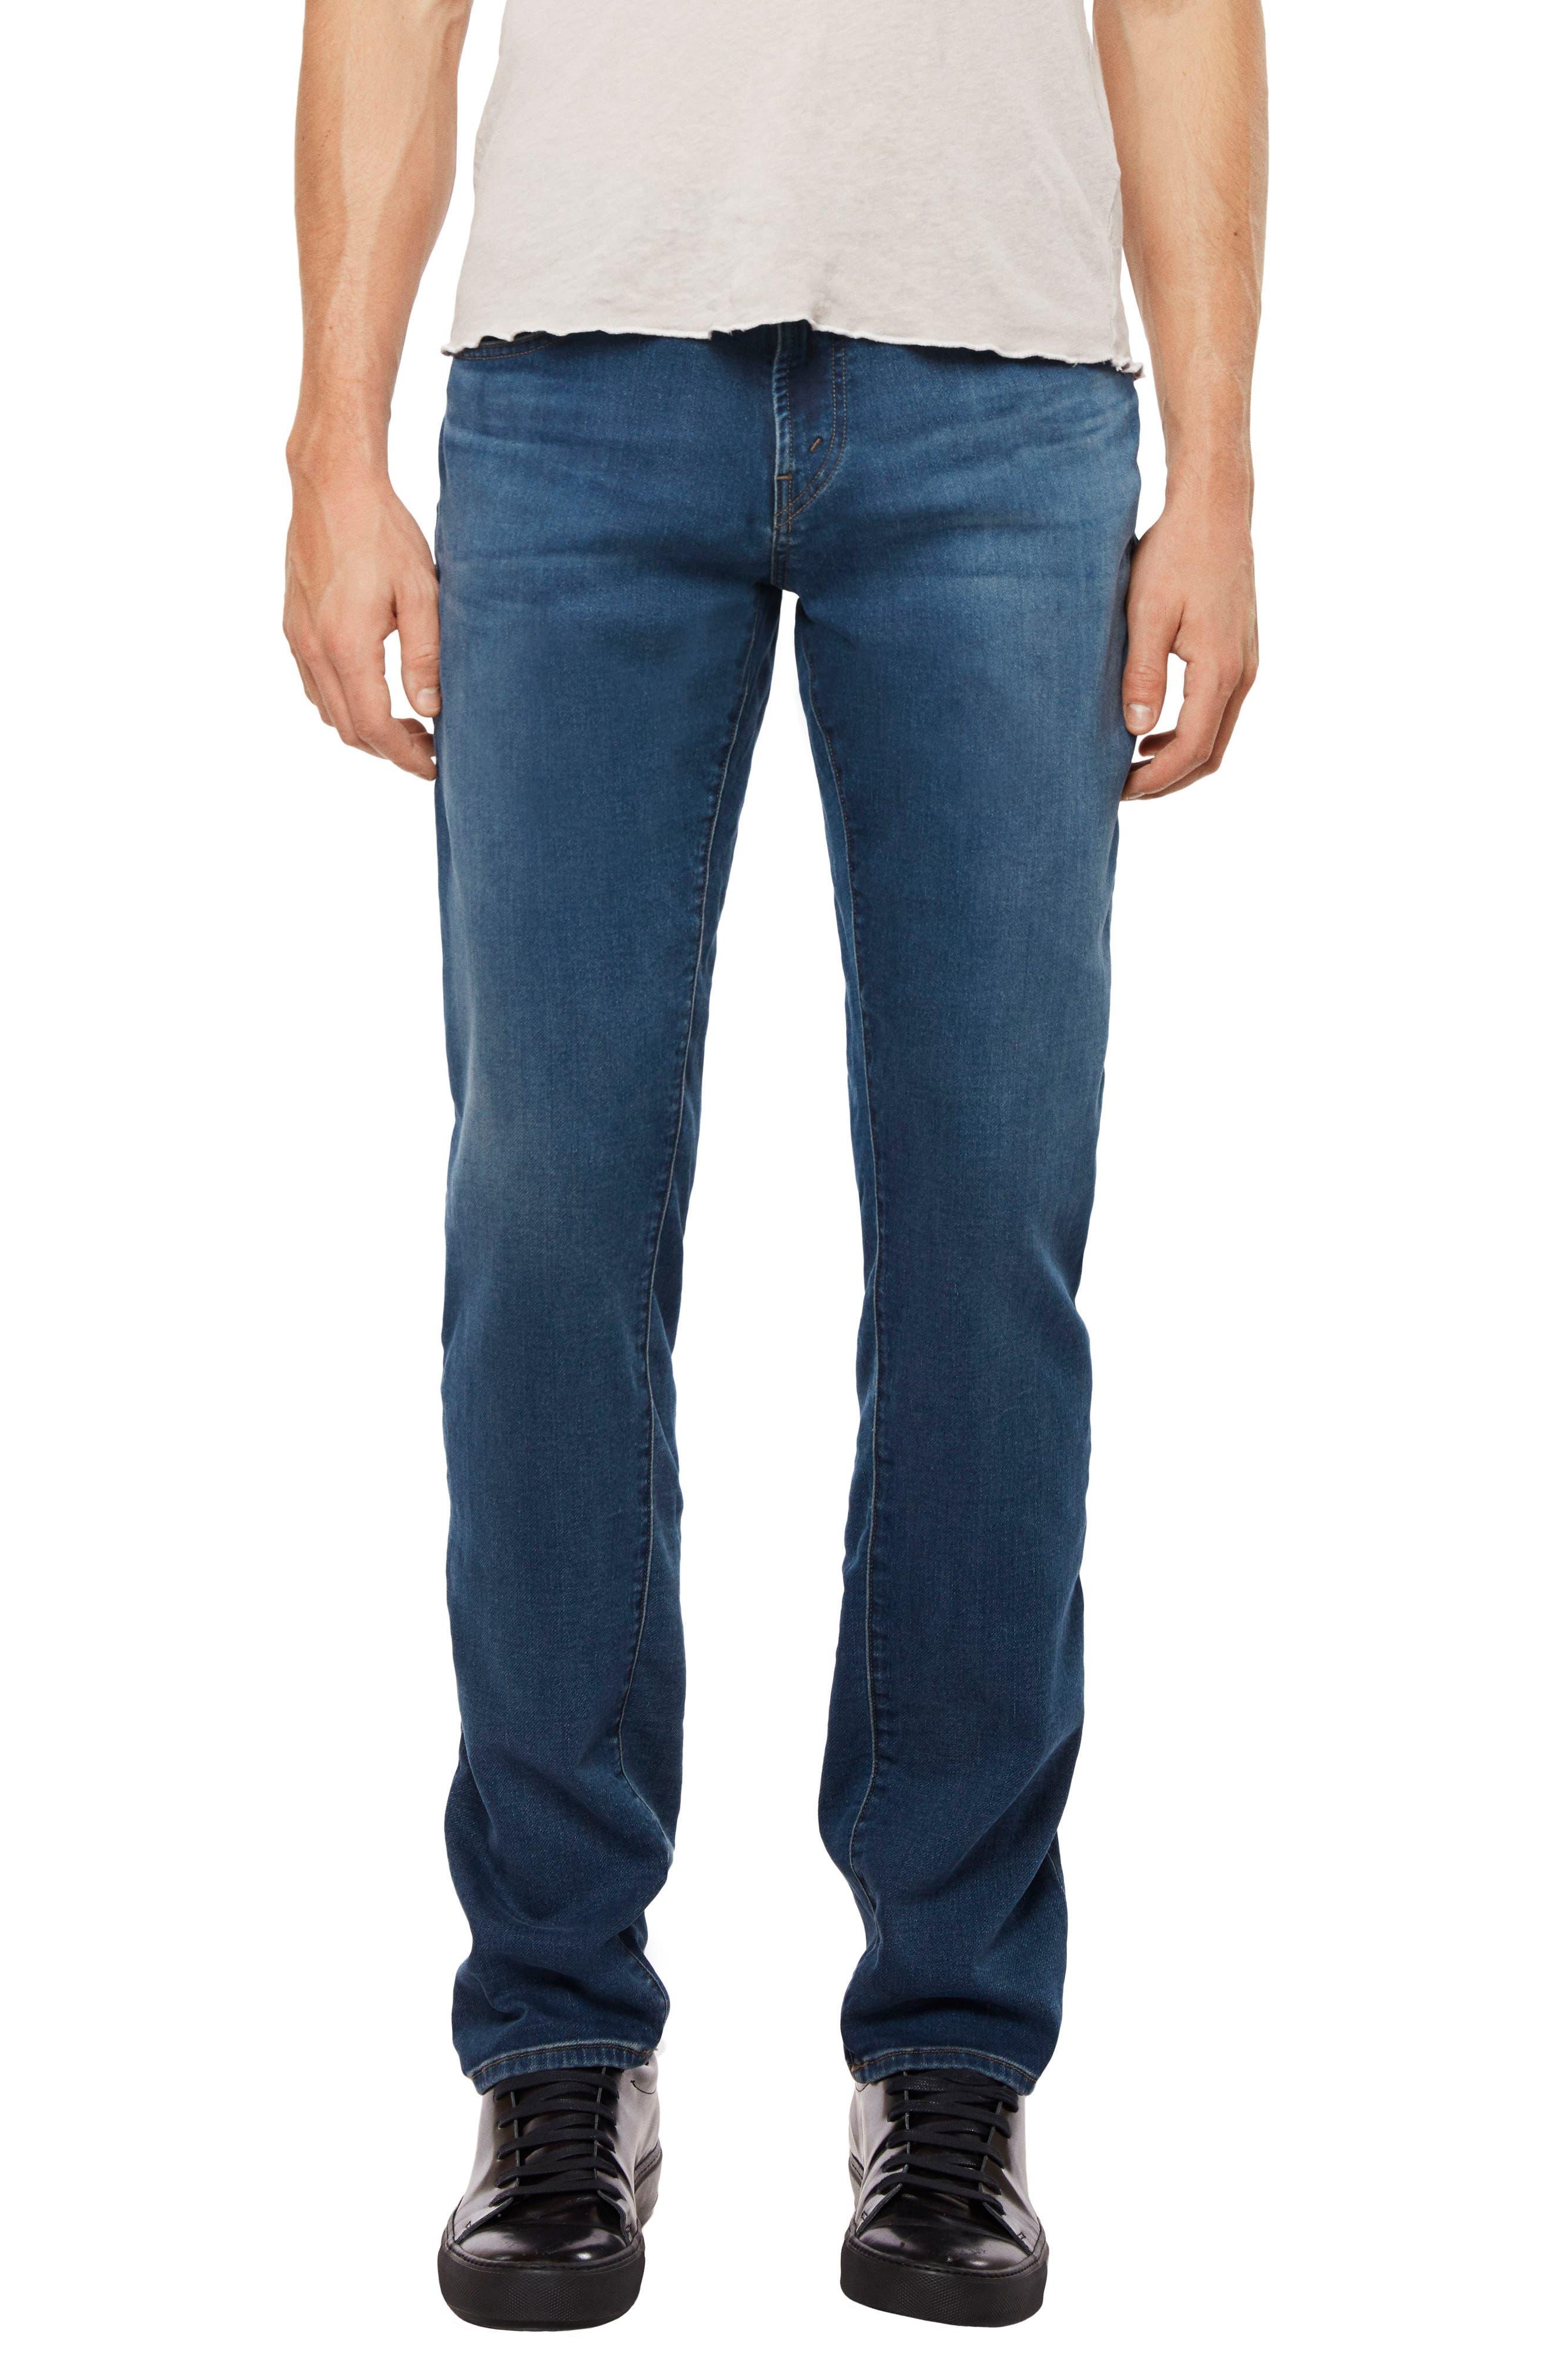 Kane Slim Straight Leg Jeans,                         Main,                         color, Landform